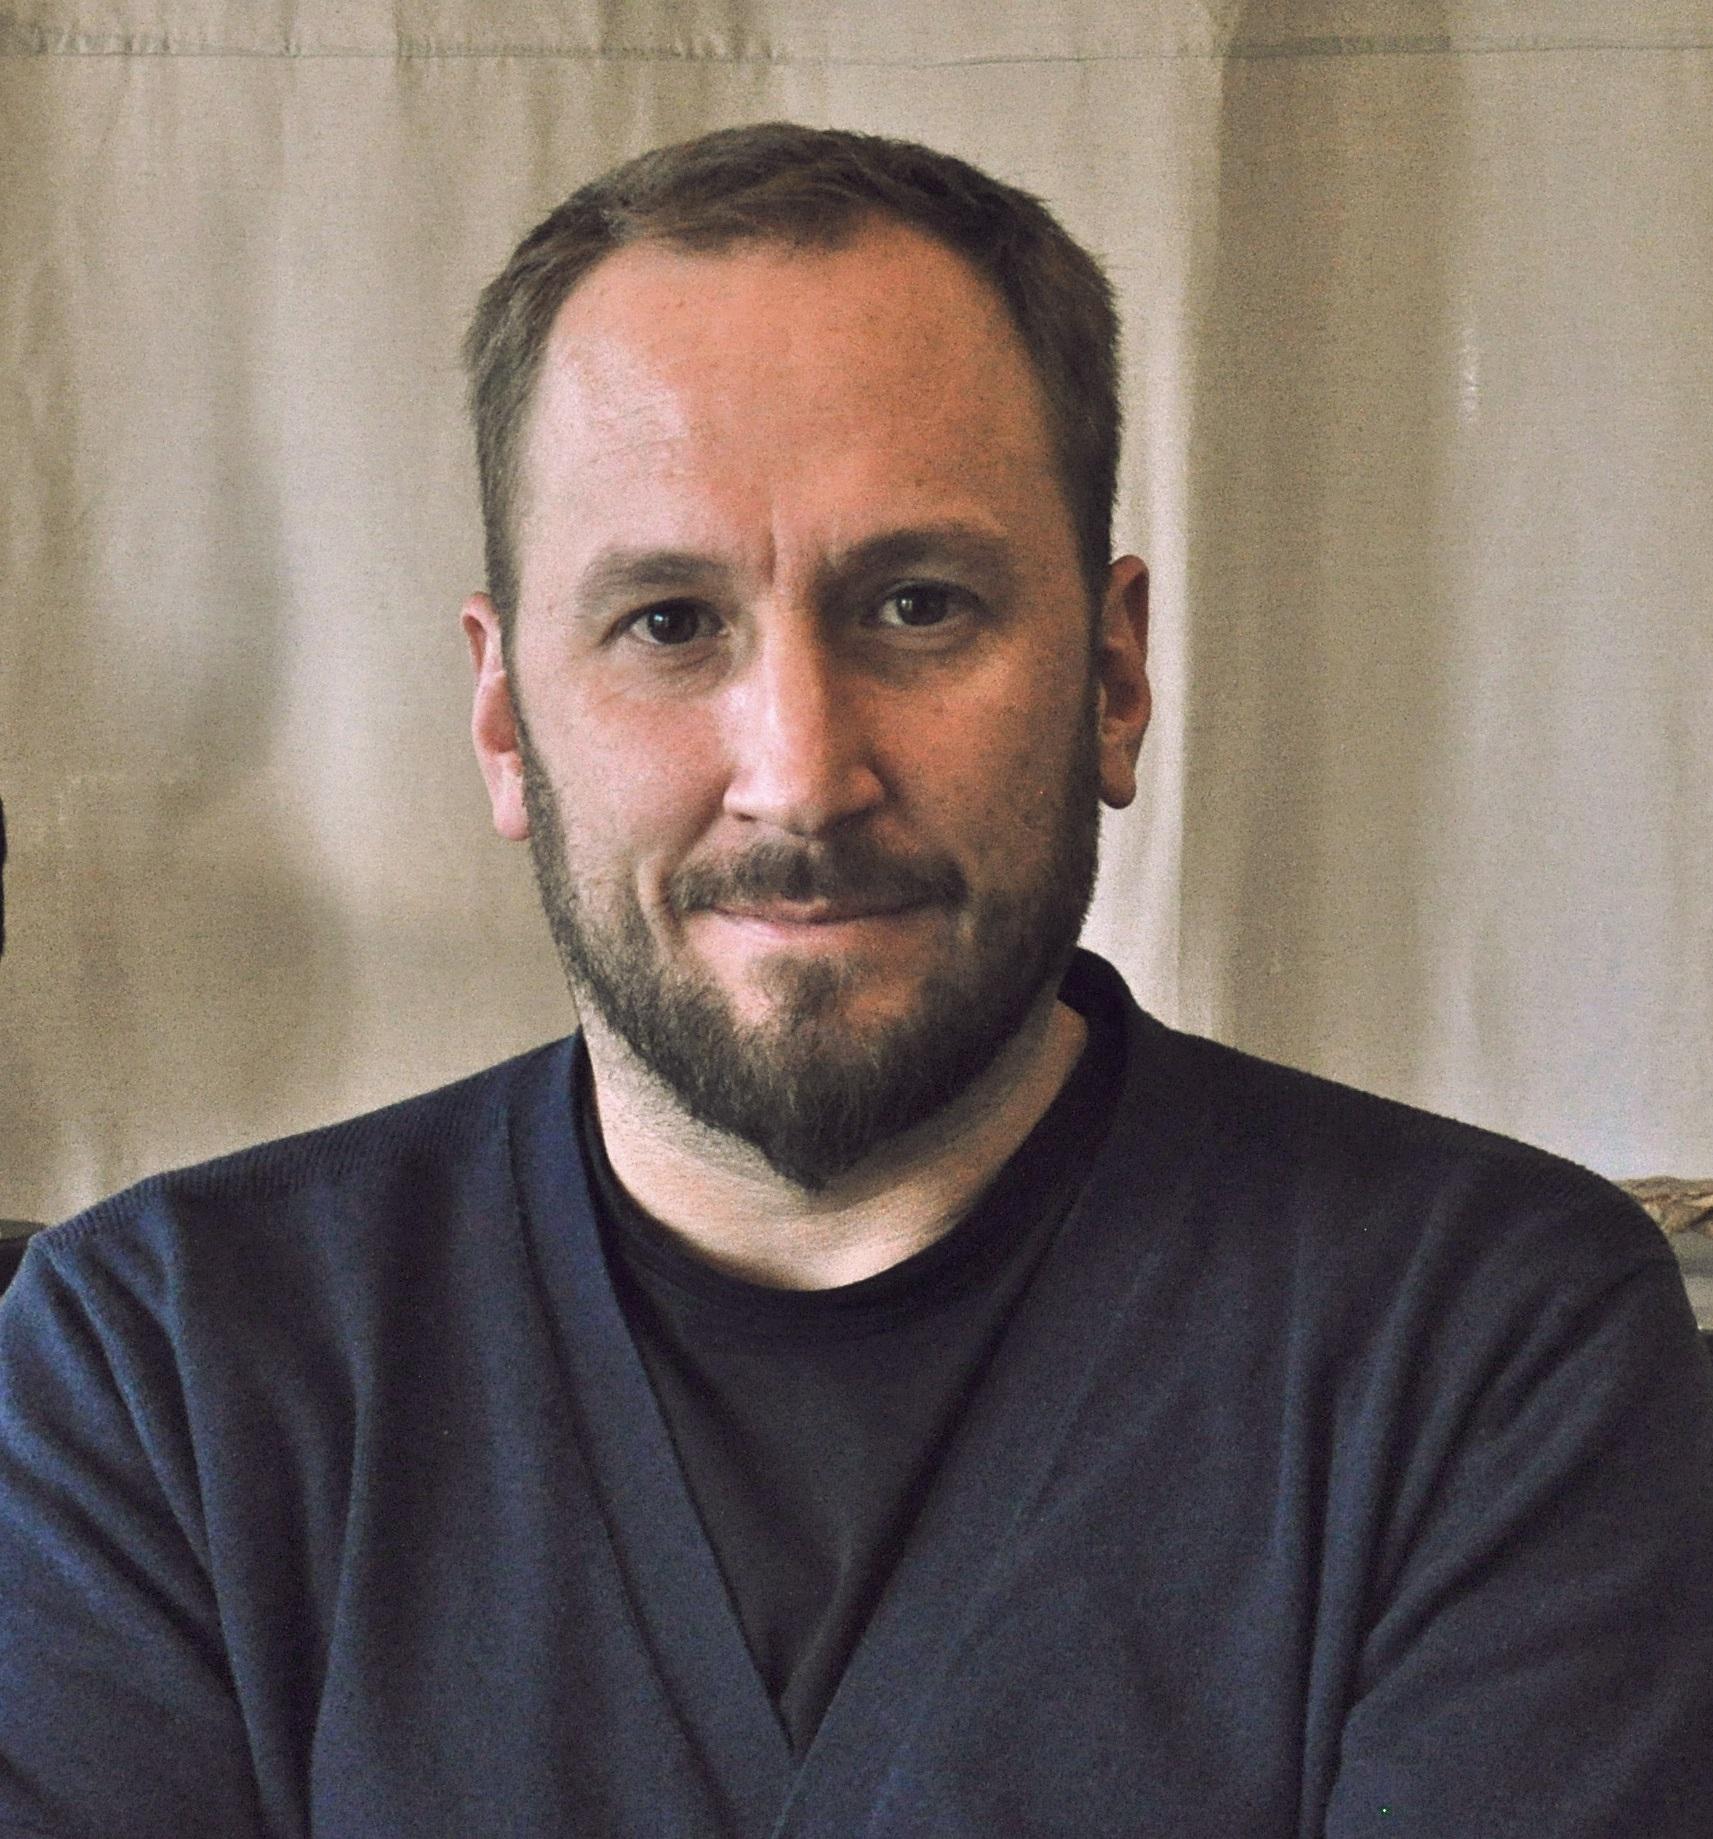 Camp + King Names Michael Whelan Studio Director